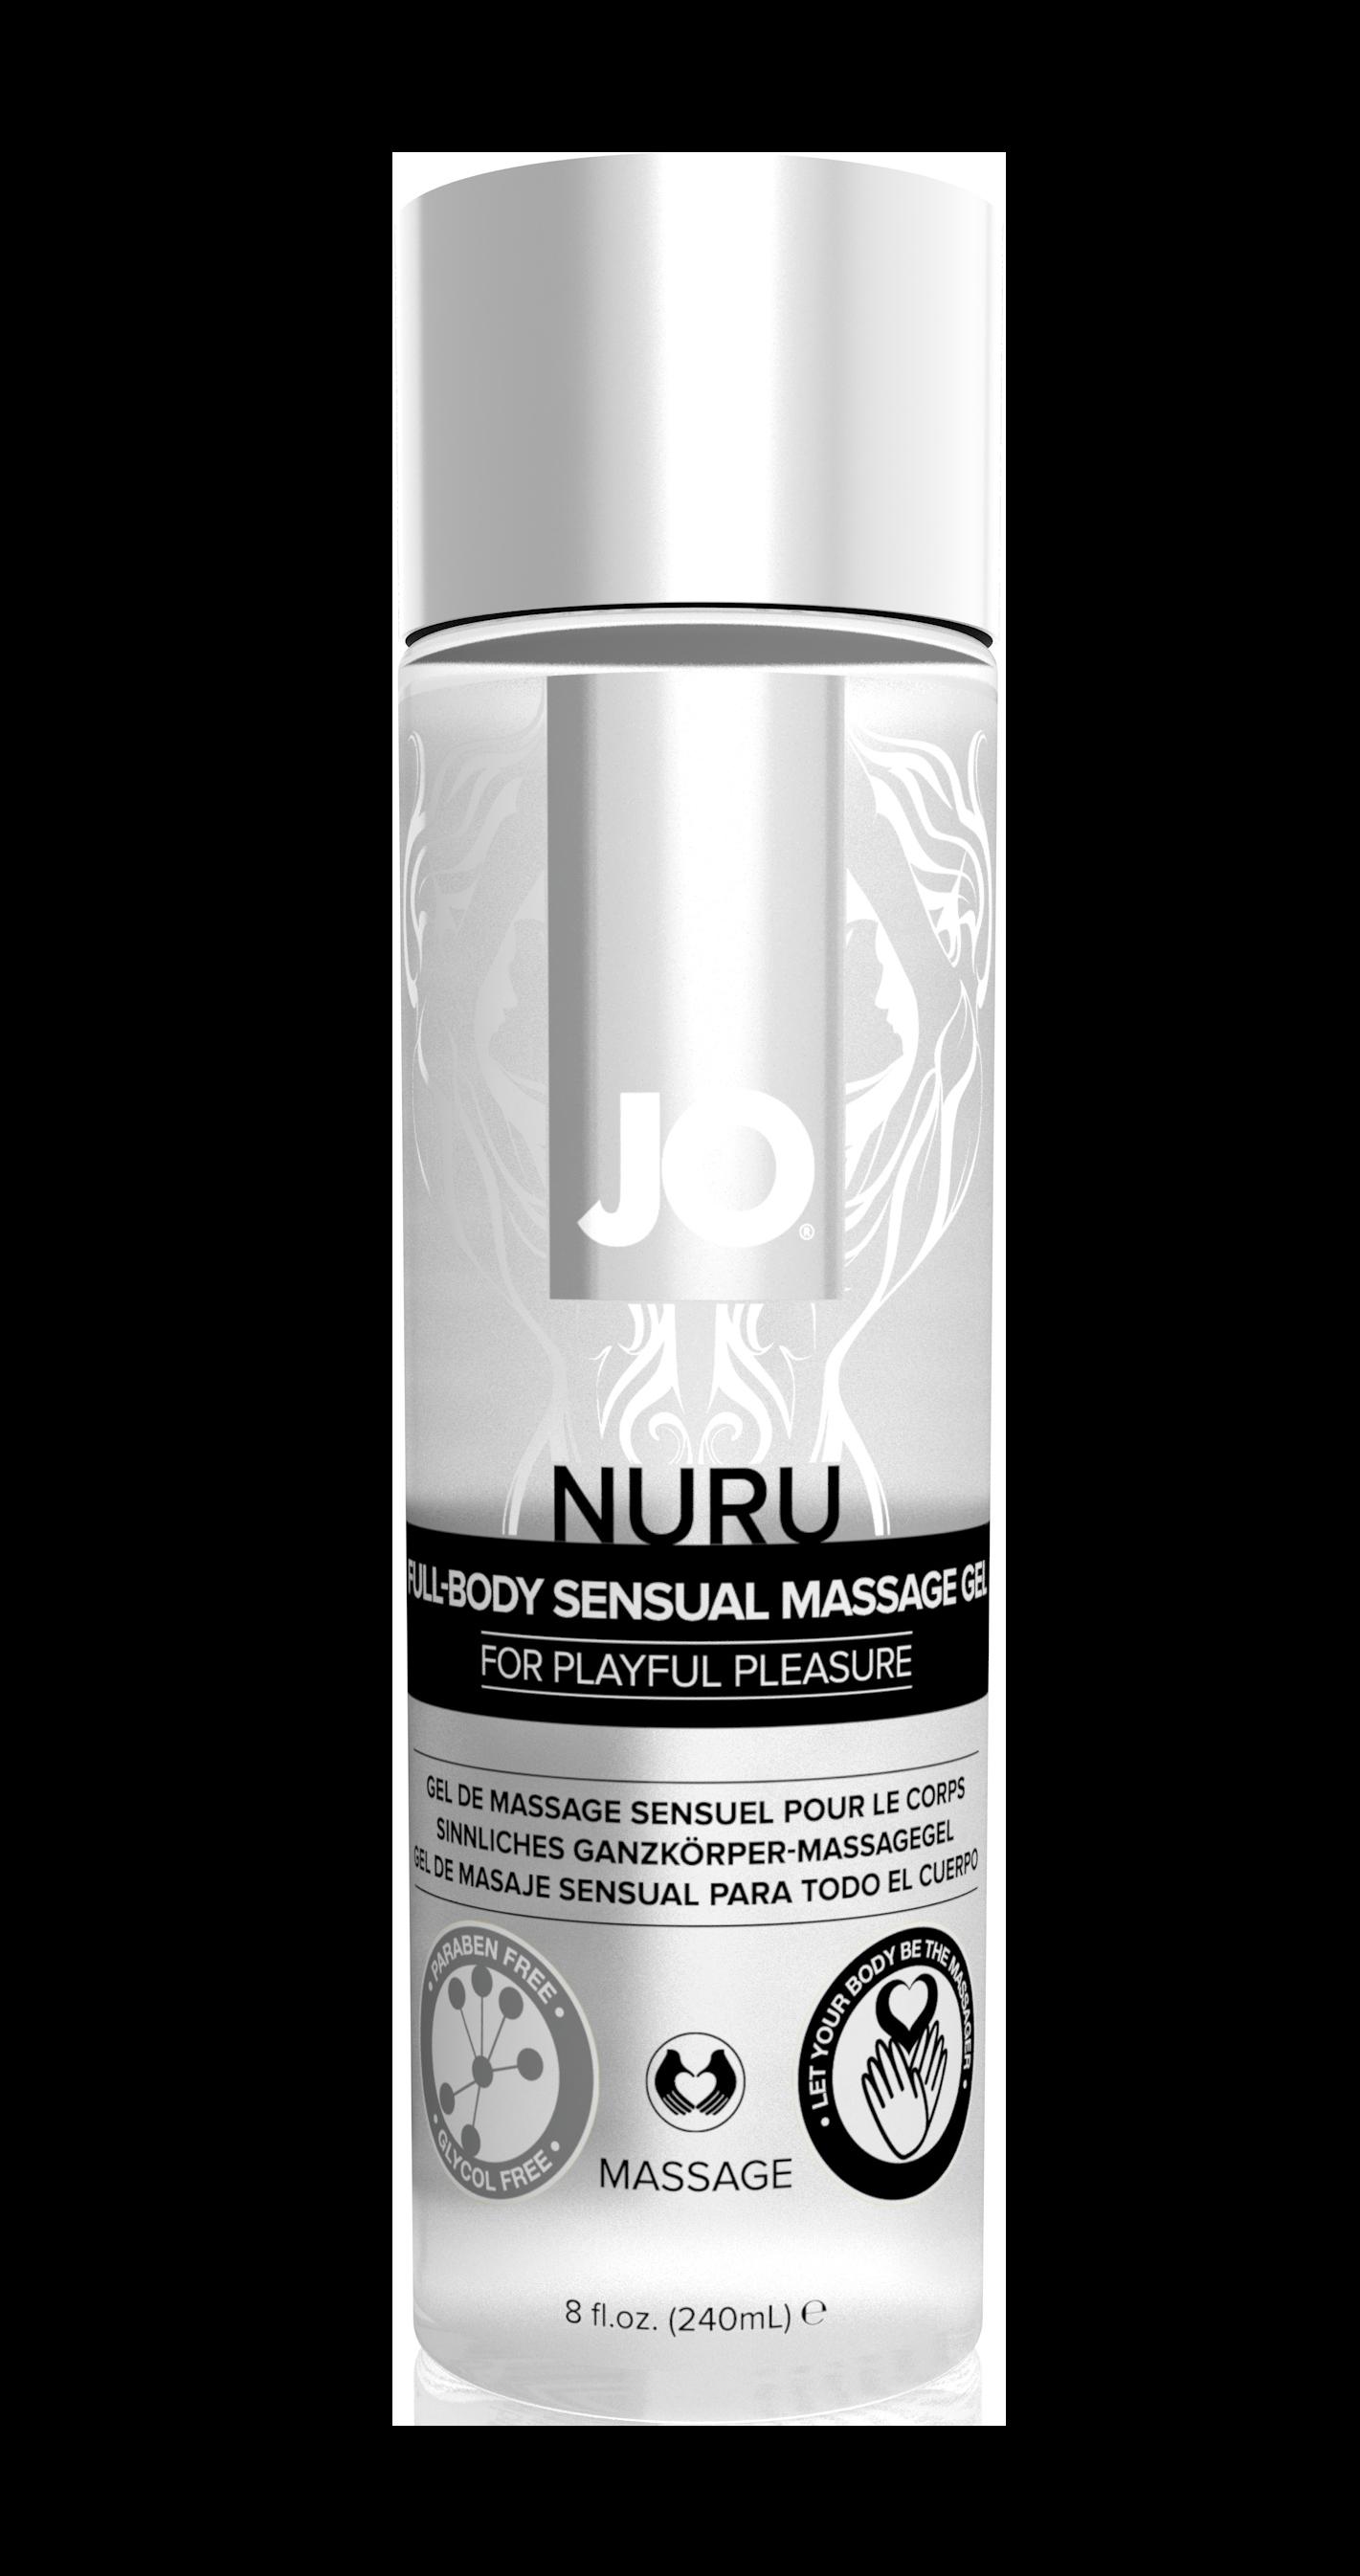 48005 - JO NURU - FULL BODY SENSUAL MASSAGE GEL - 8fl.oz 240mL C (RGB).png